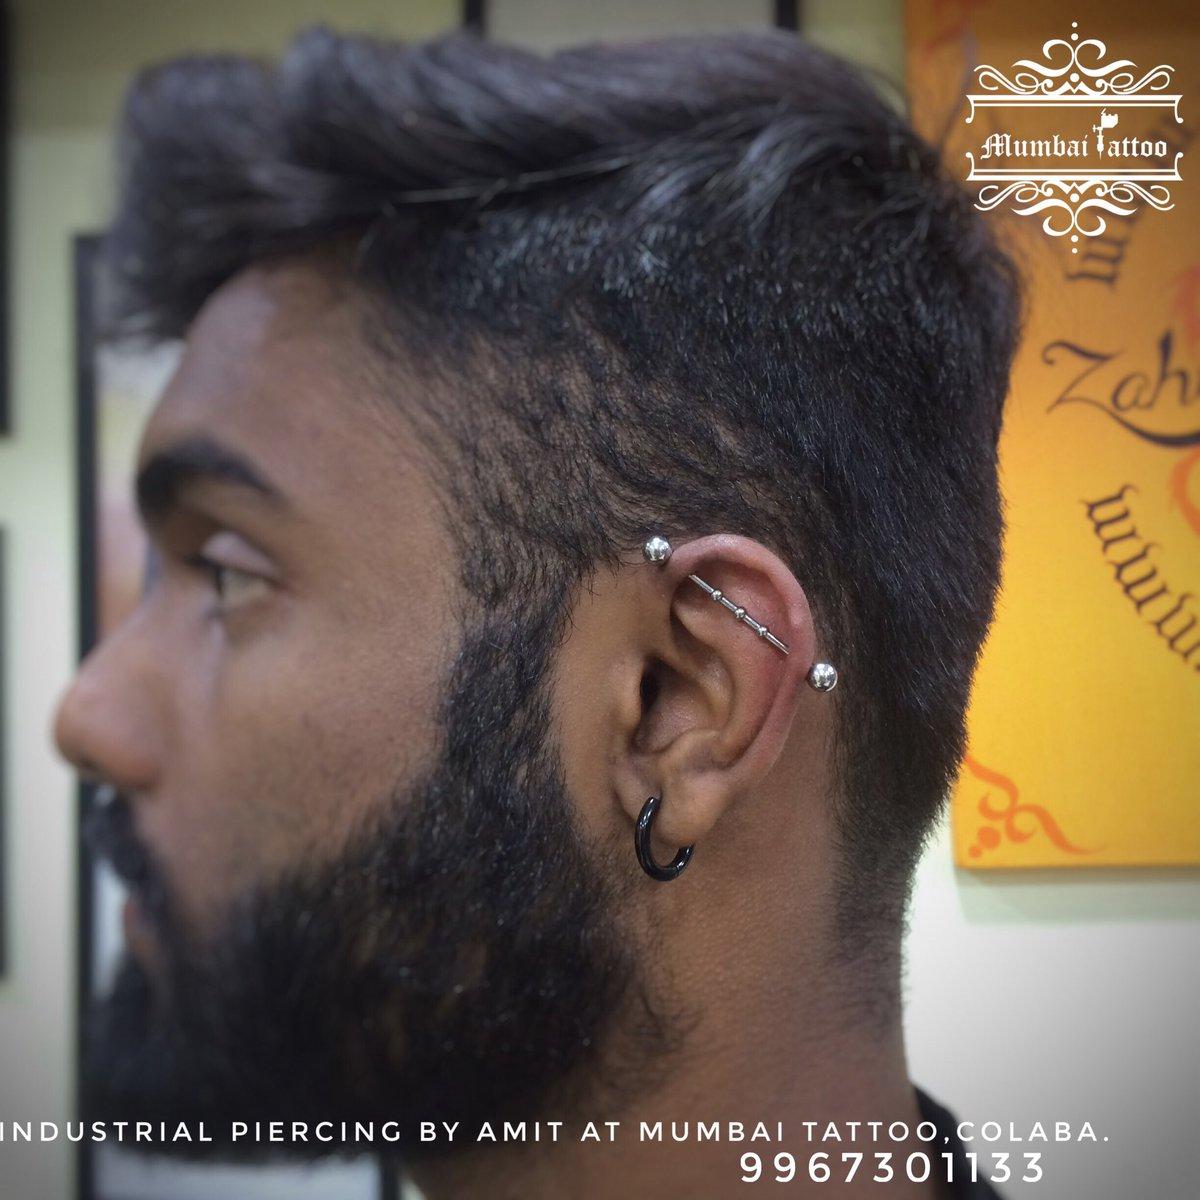 Mumbai Tattoo Colaba On Twitter Industrial Piercing